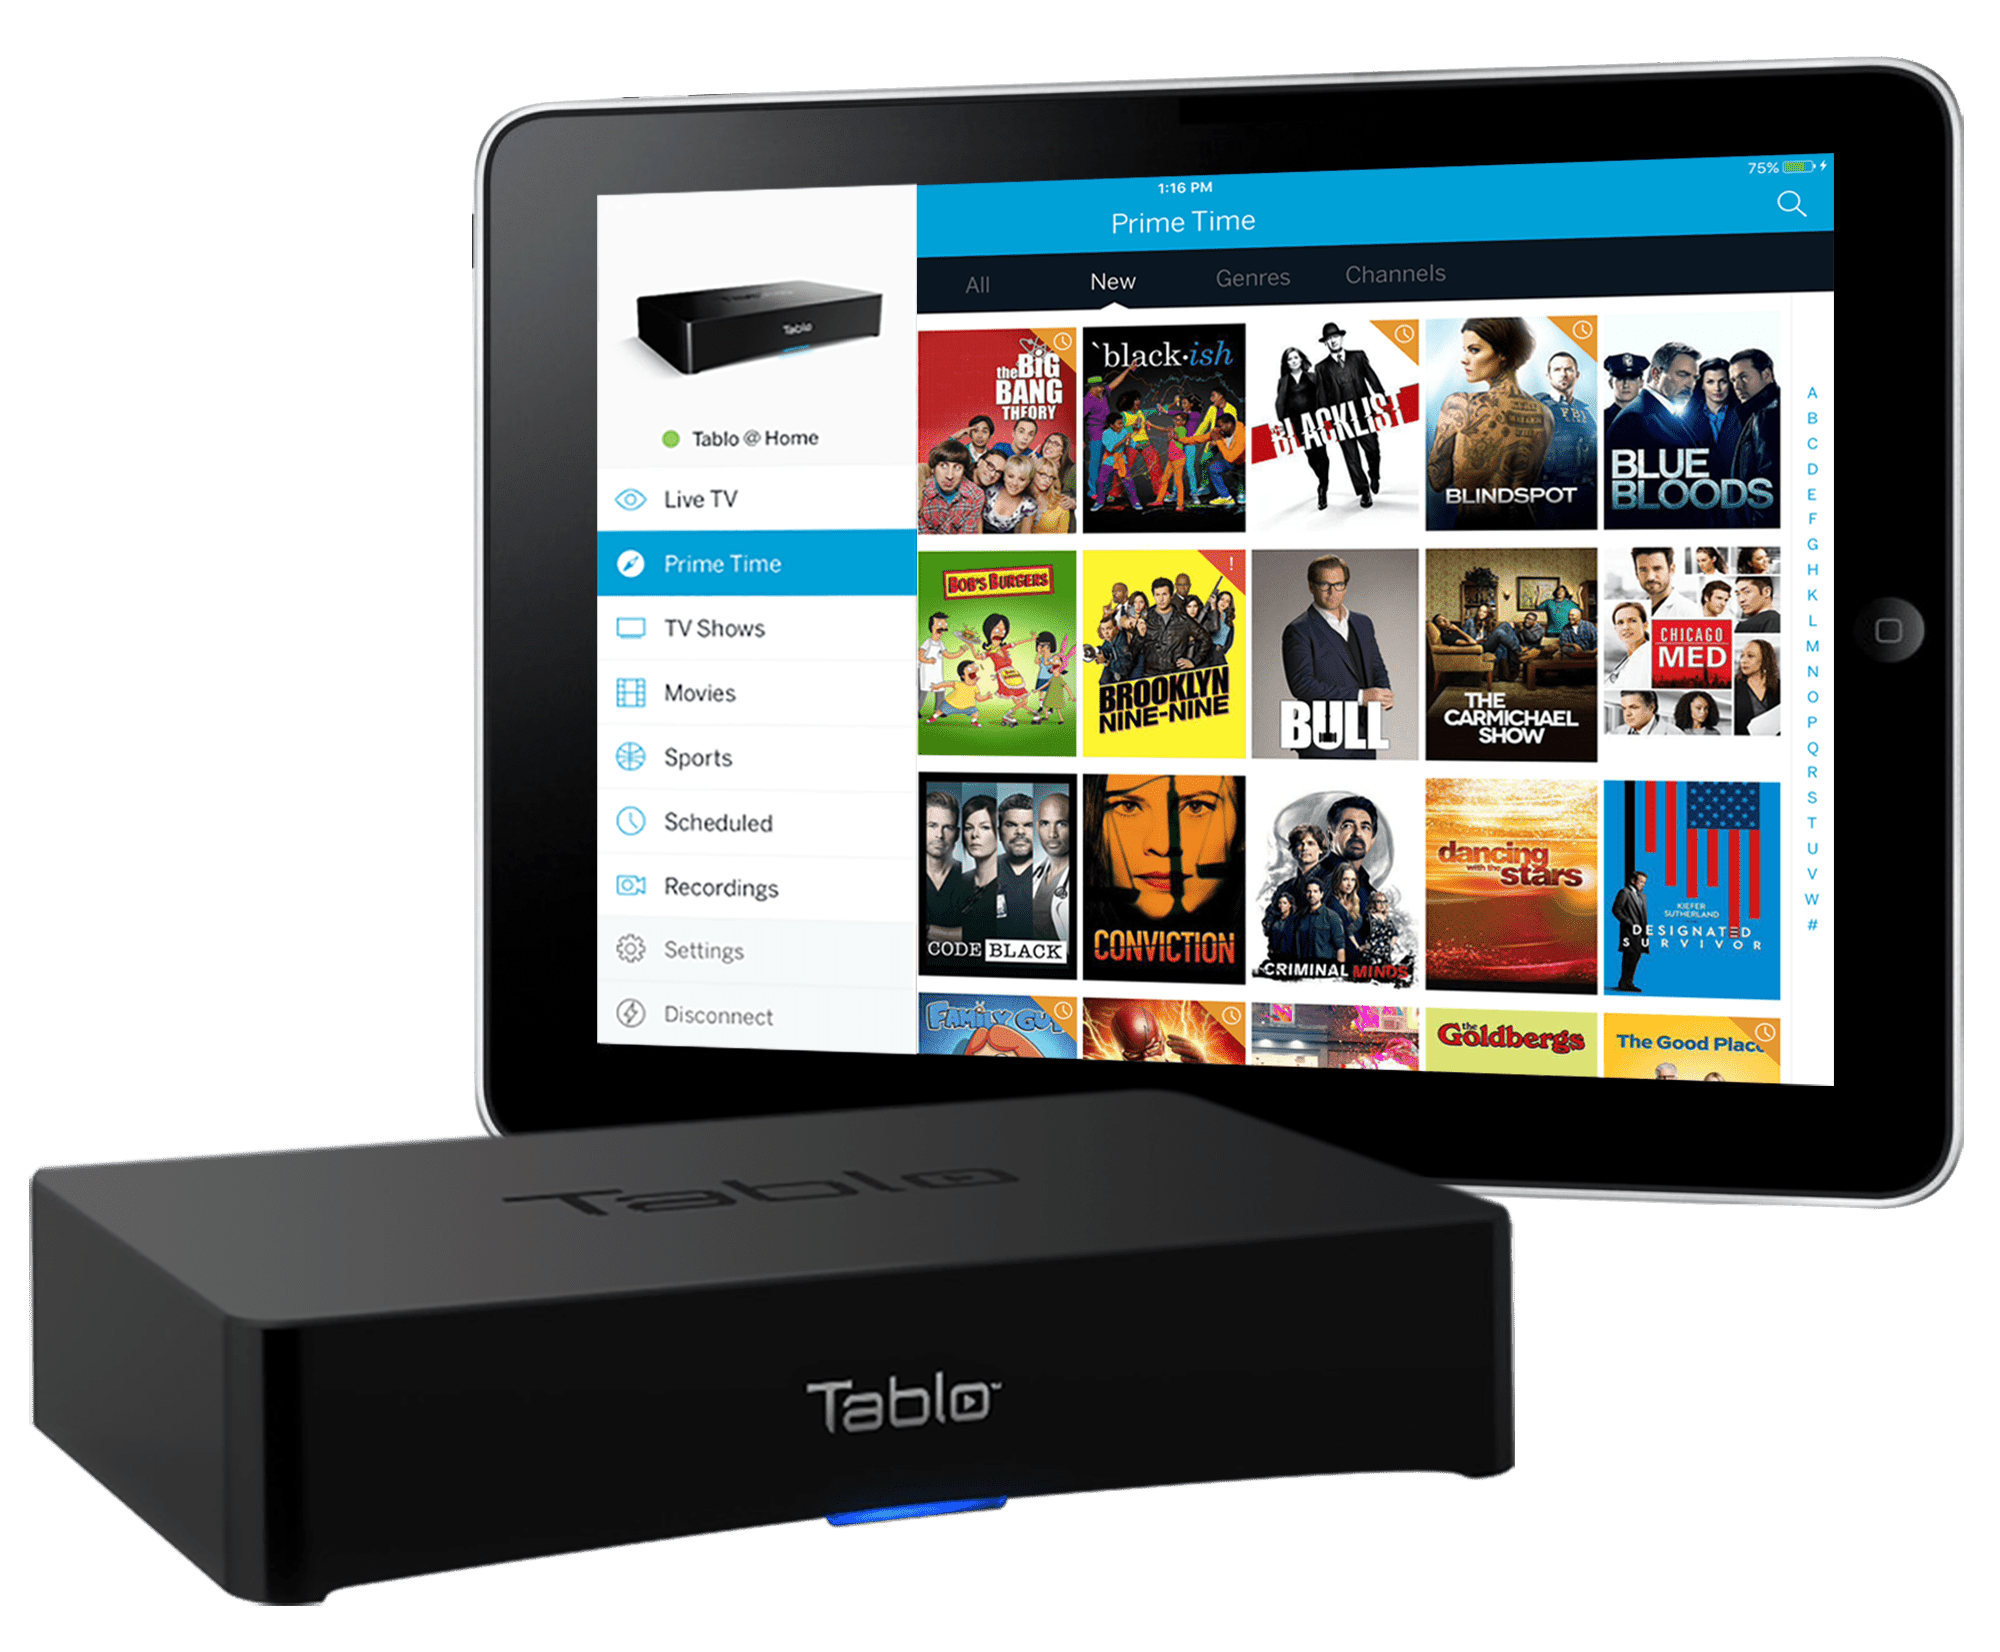 Tablo box and software